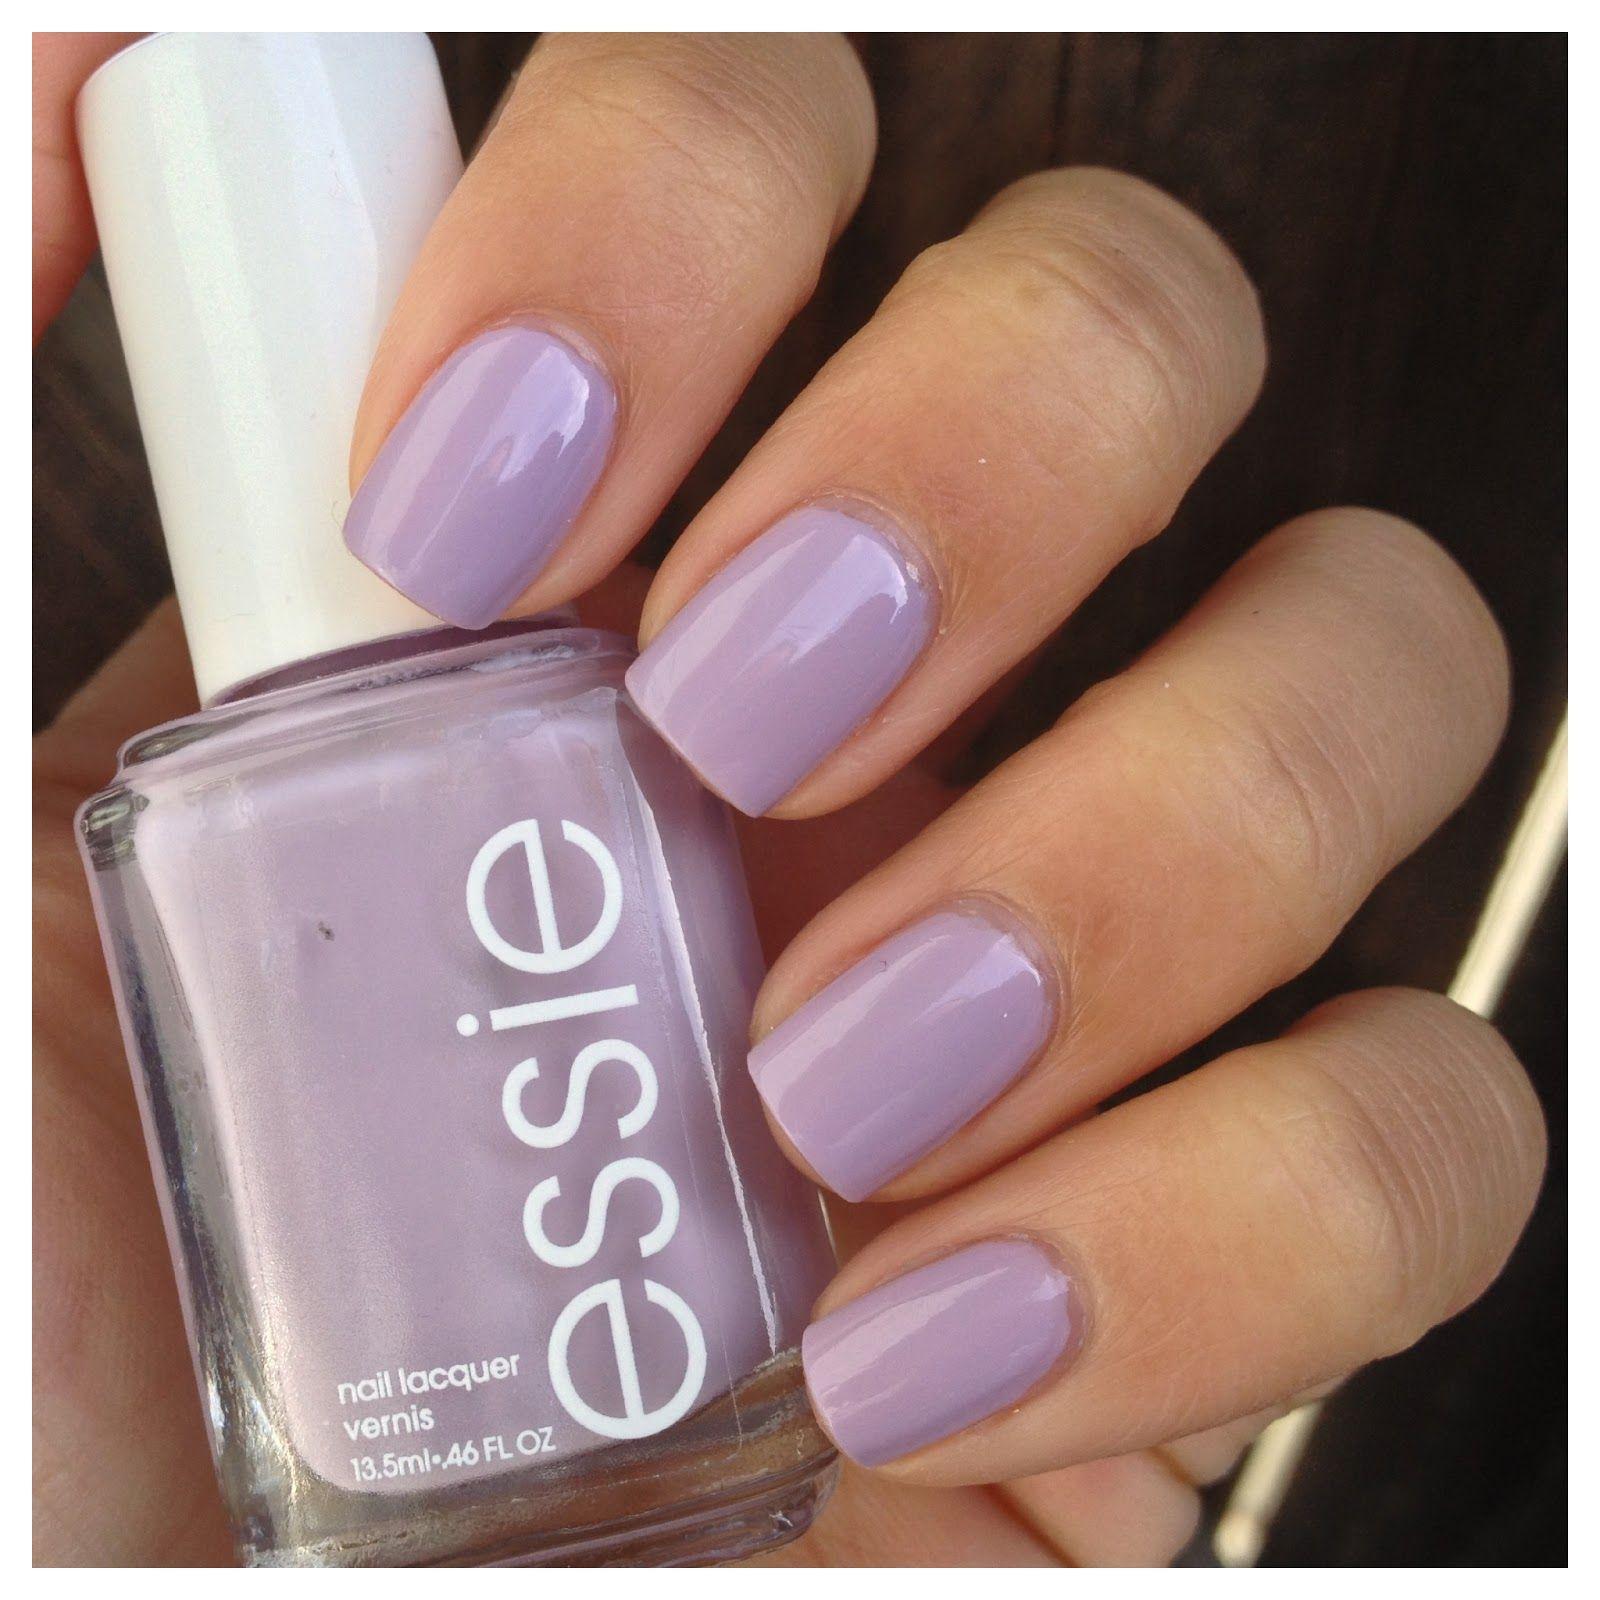 Essie\'s nice is nice - a subtle, light lavender | Nails: Polish ...